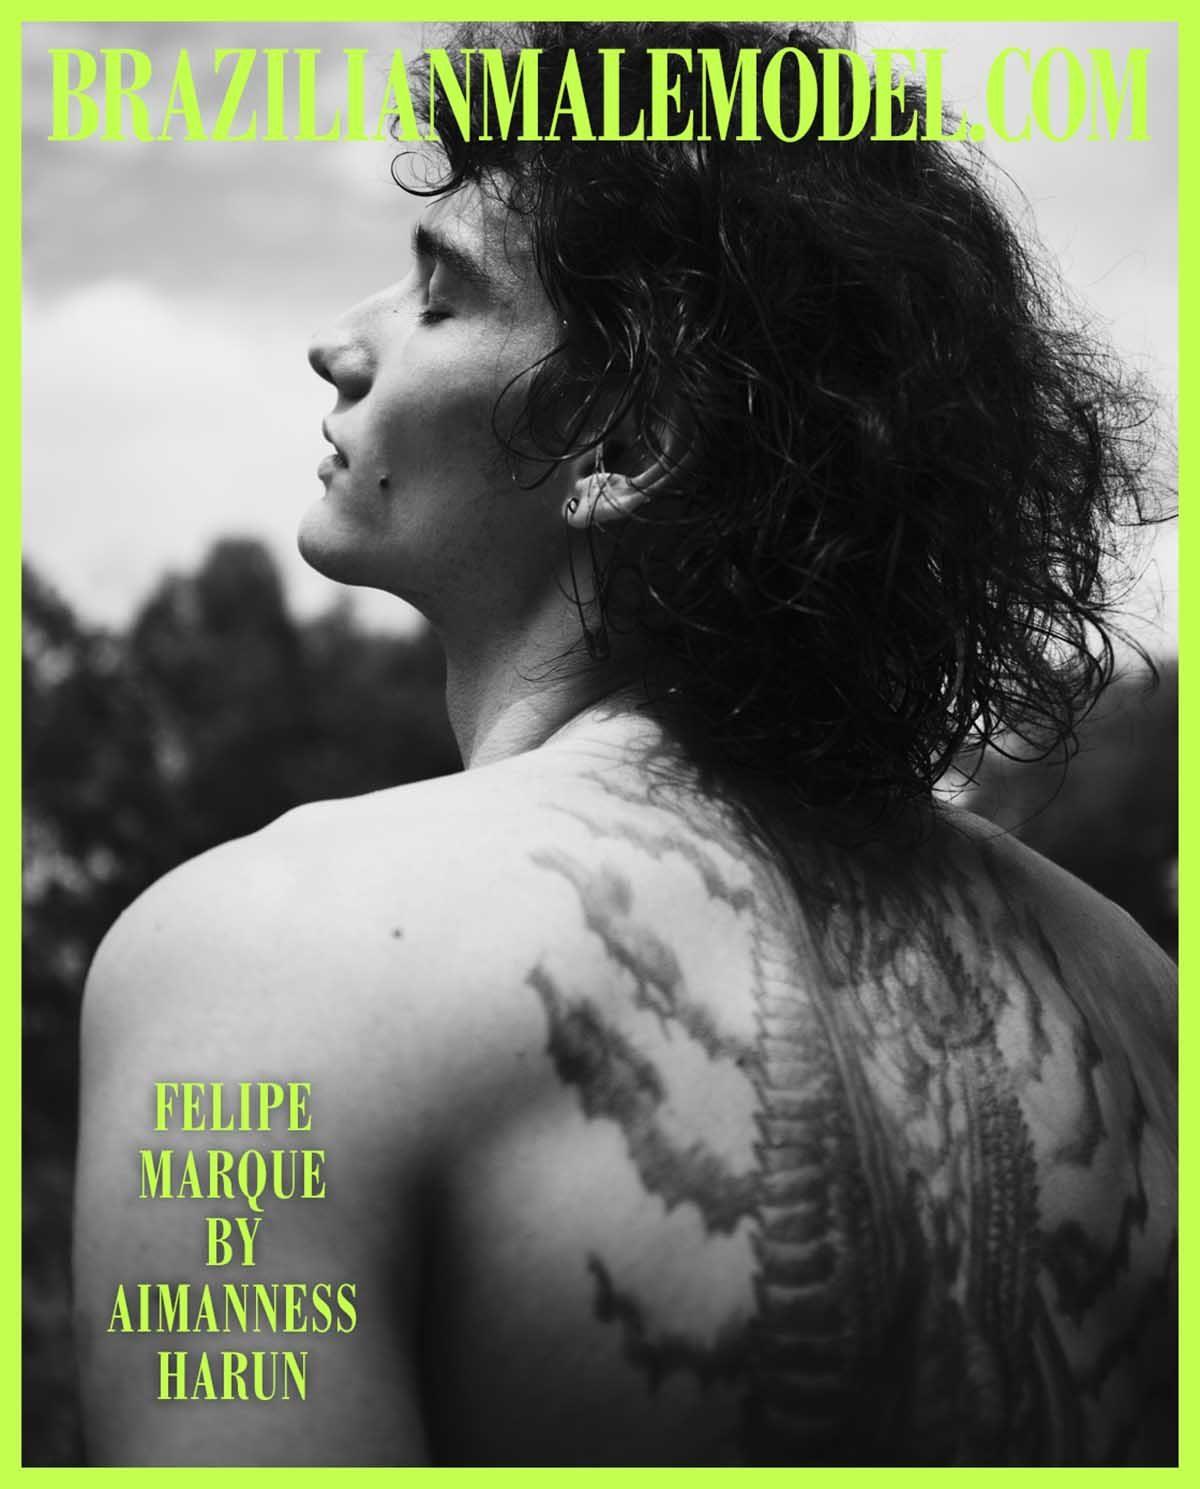 Felipe Marque by Aimanness Harun